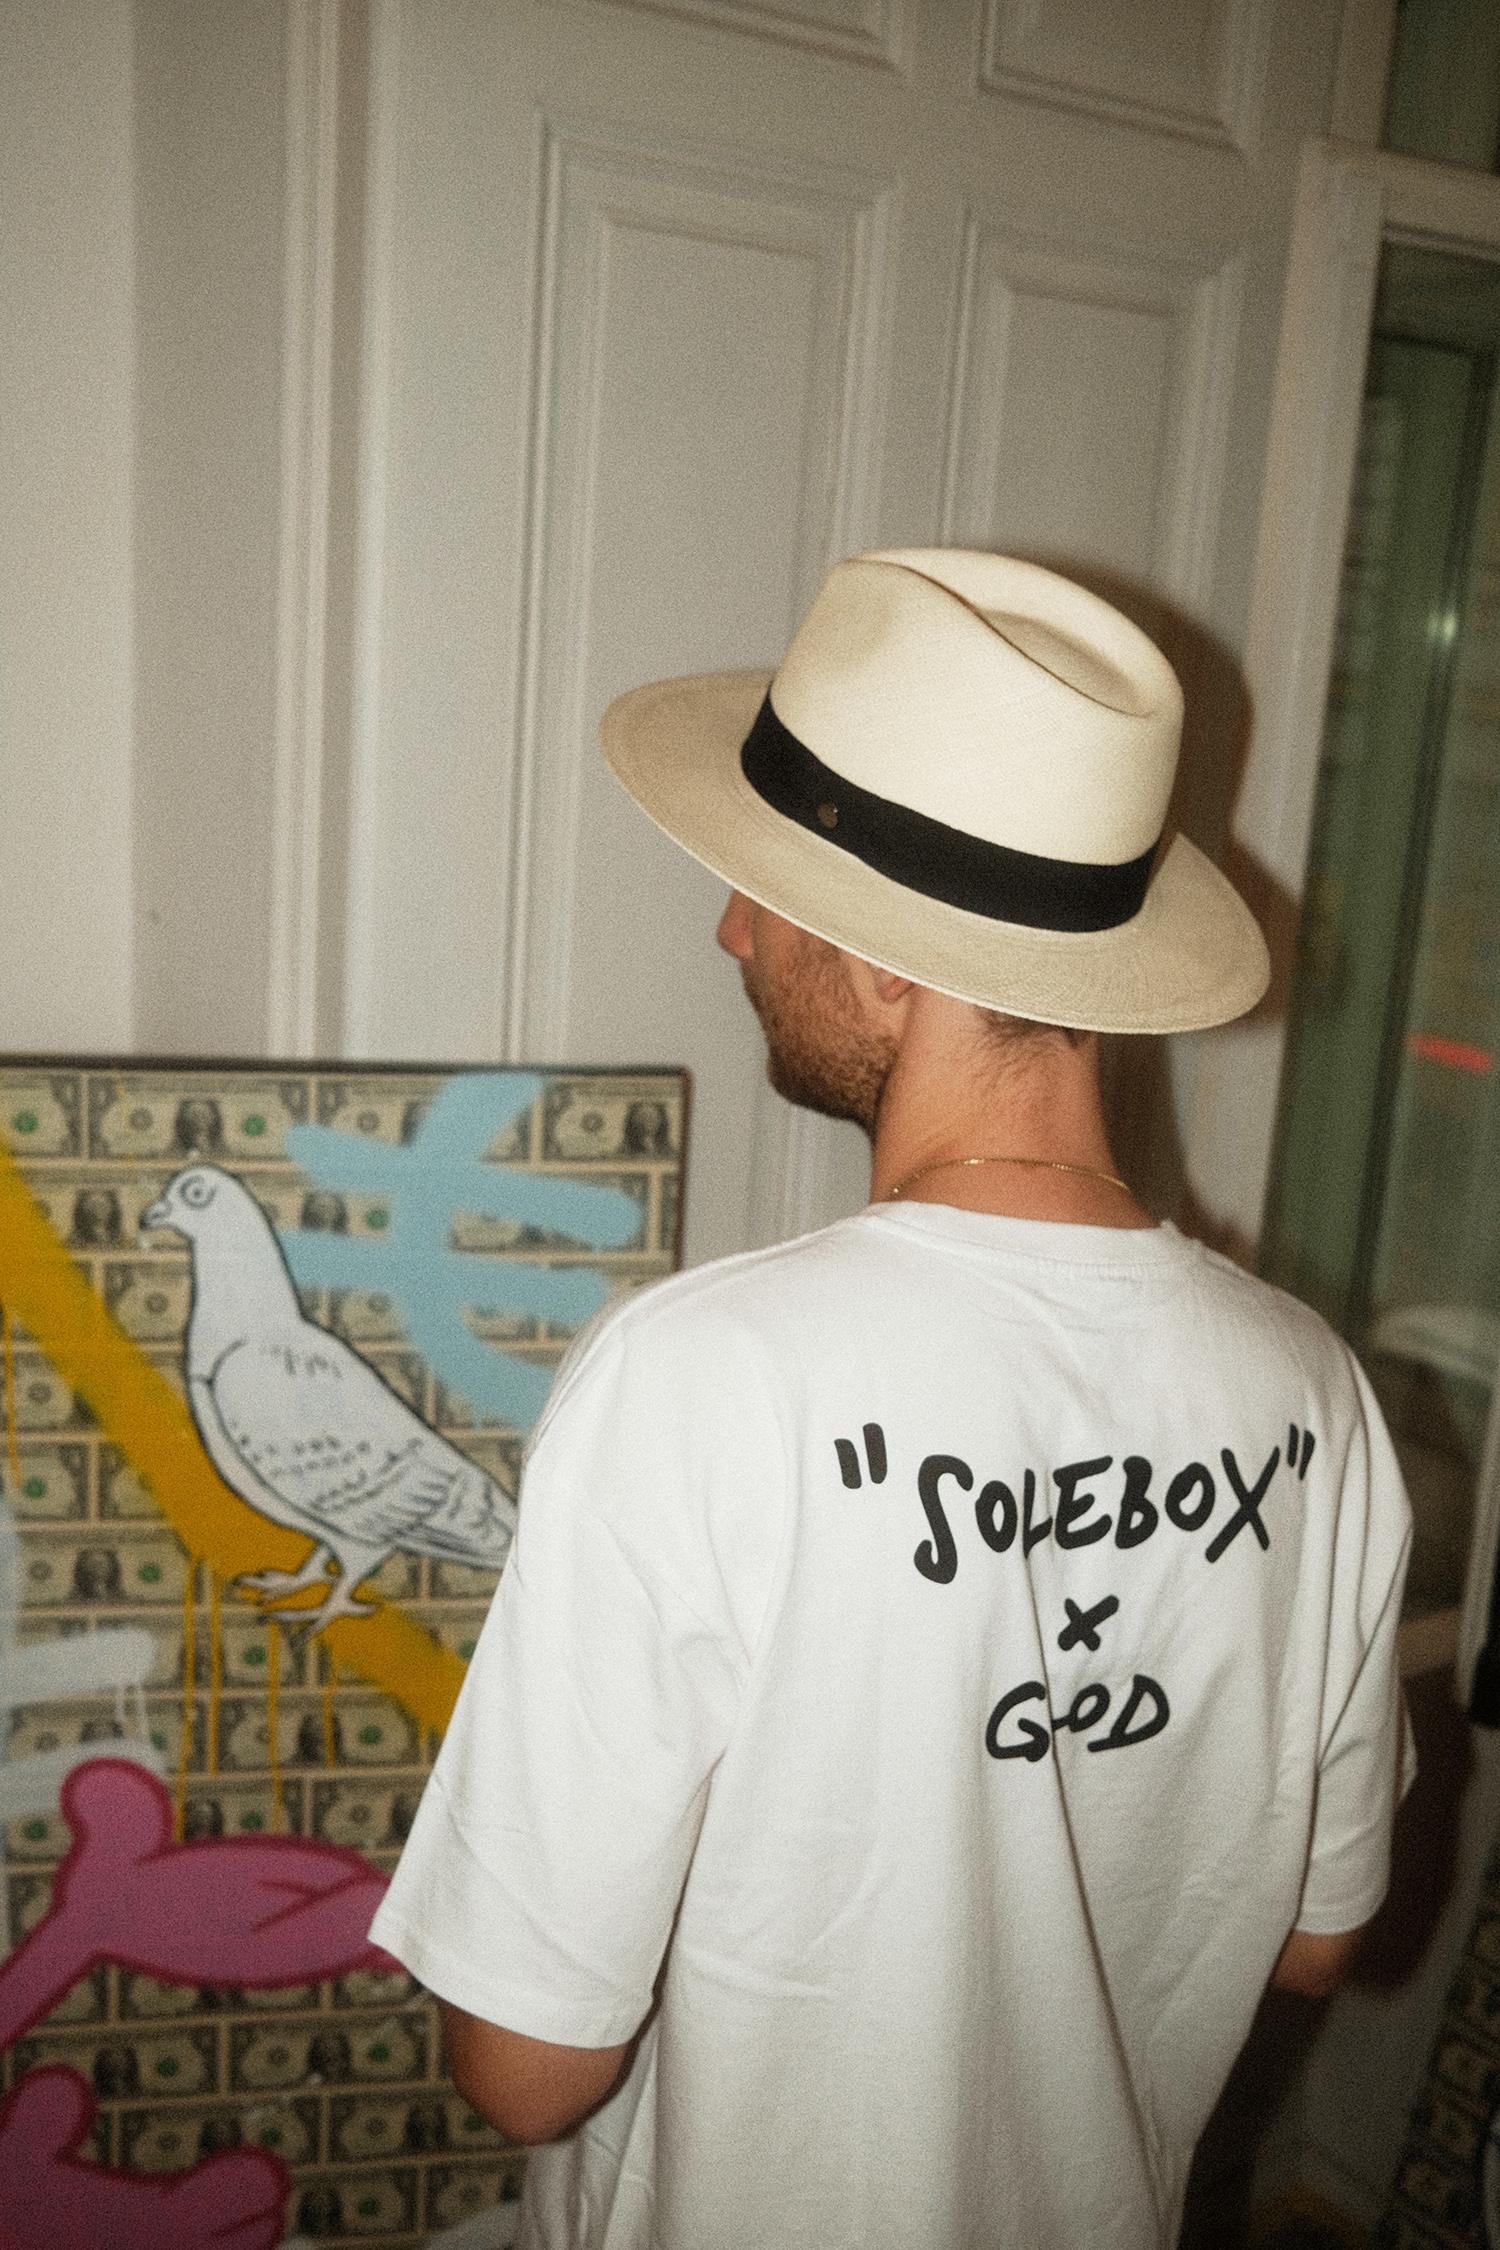 07 Glod Studio Shirt ©Michal Cieplucha 17. Juni 2021